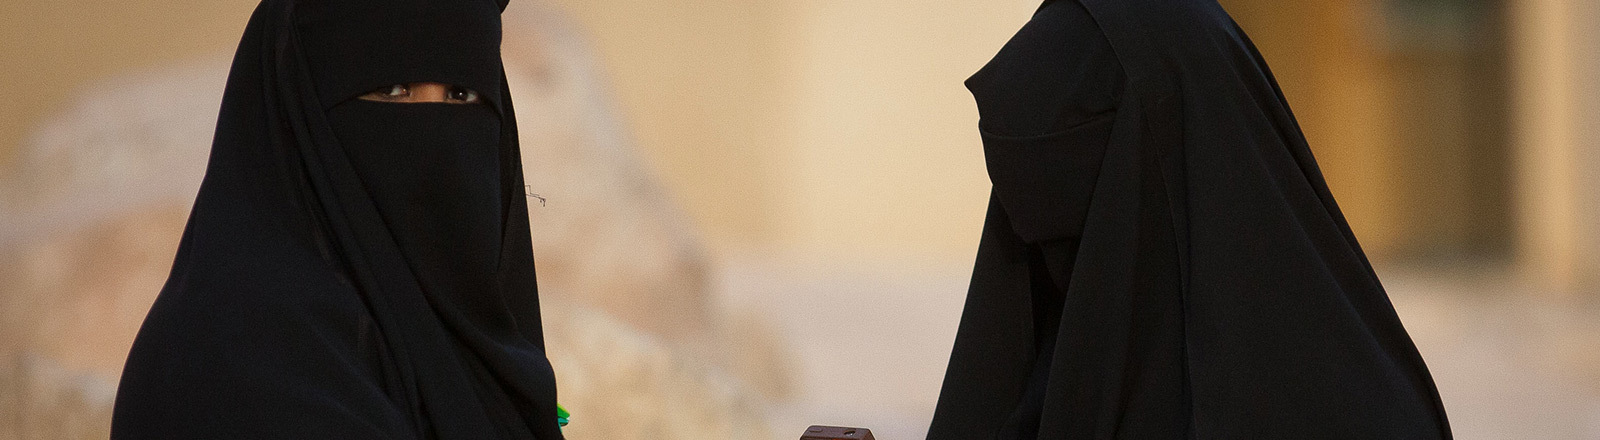 Zwei Frauen in Saudi-Arabien